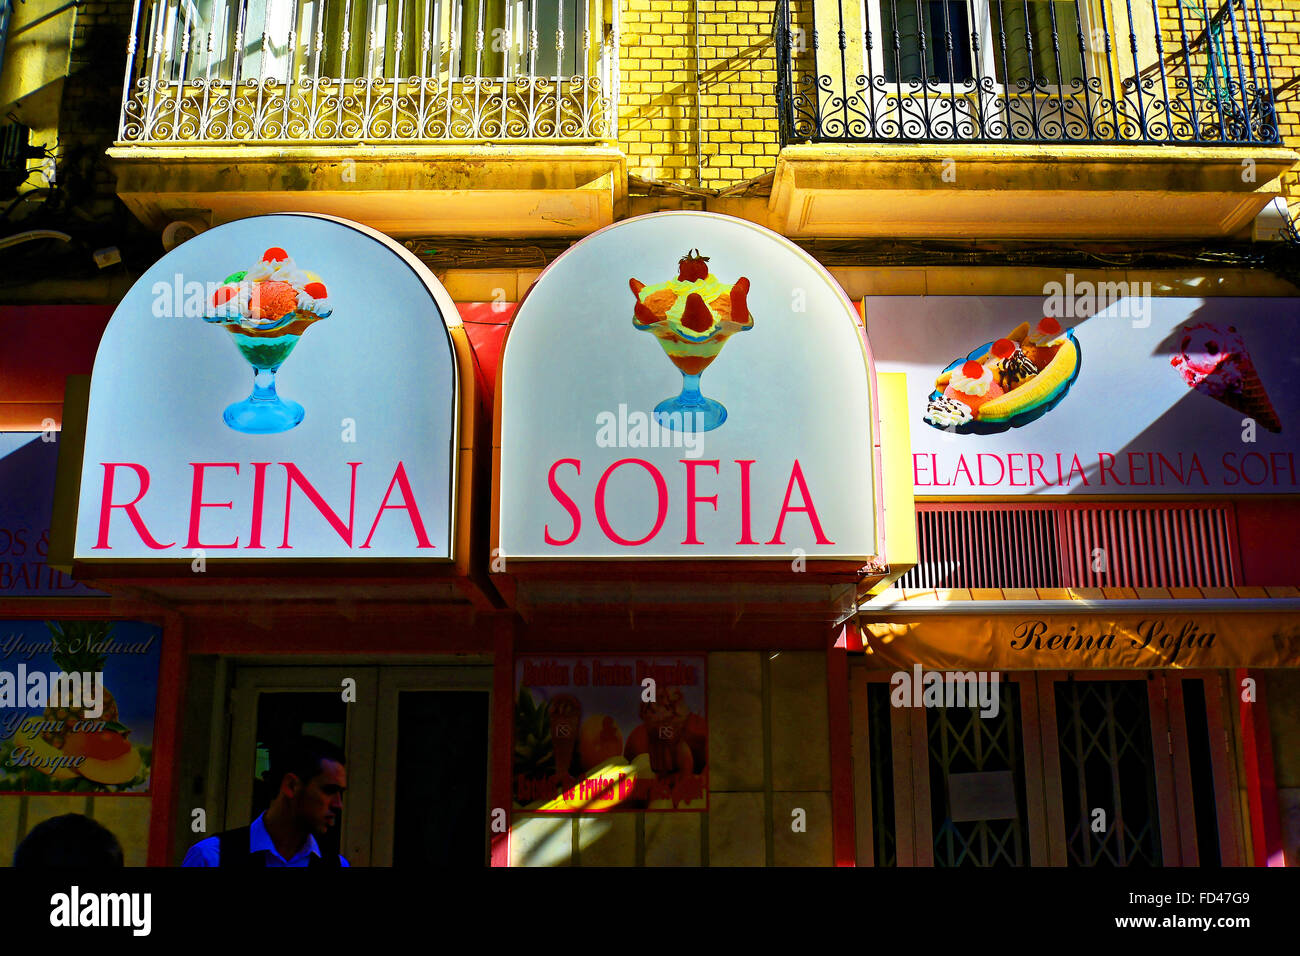 Spain Cartagena Reina Sofia ice cream heladeria Stock Photo